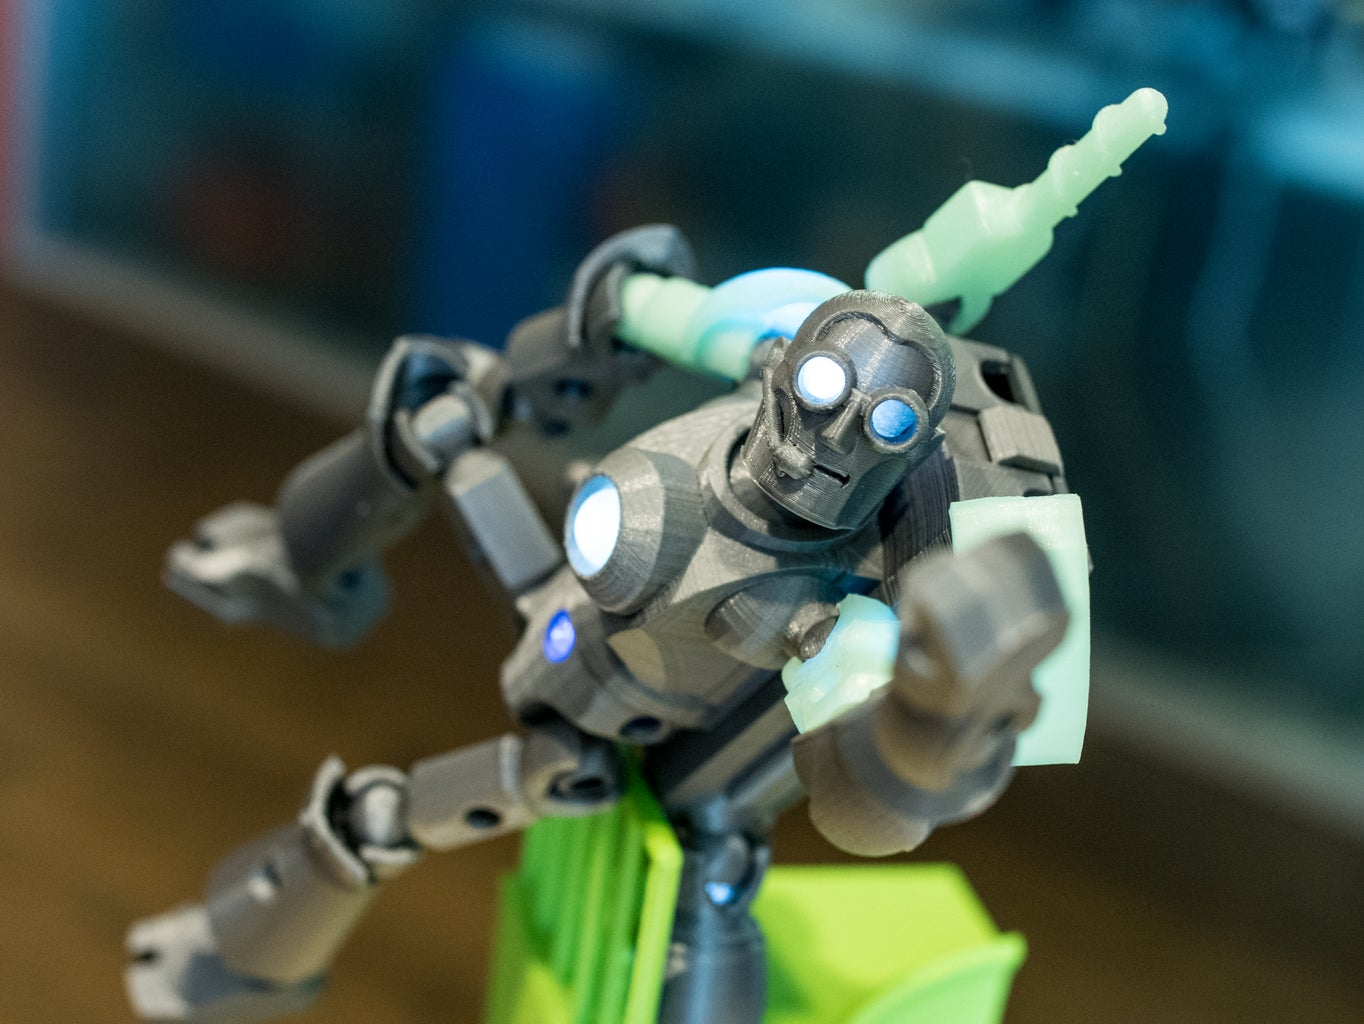 Build a Custom 3d Printed, Light-up Figure